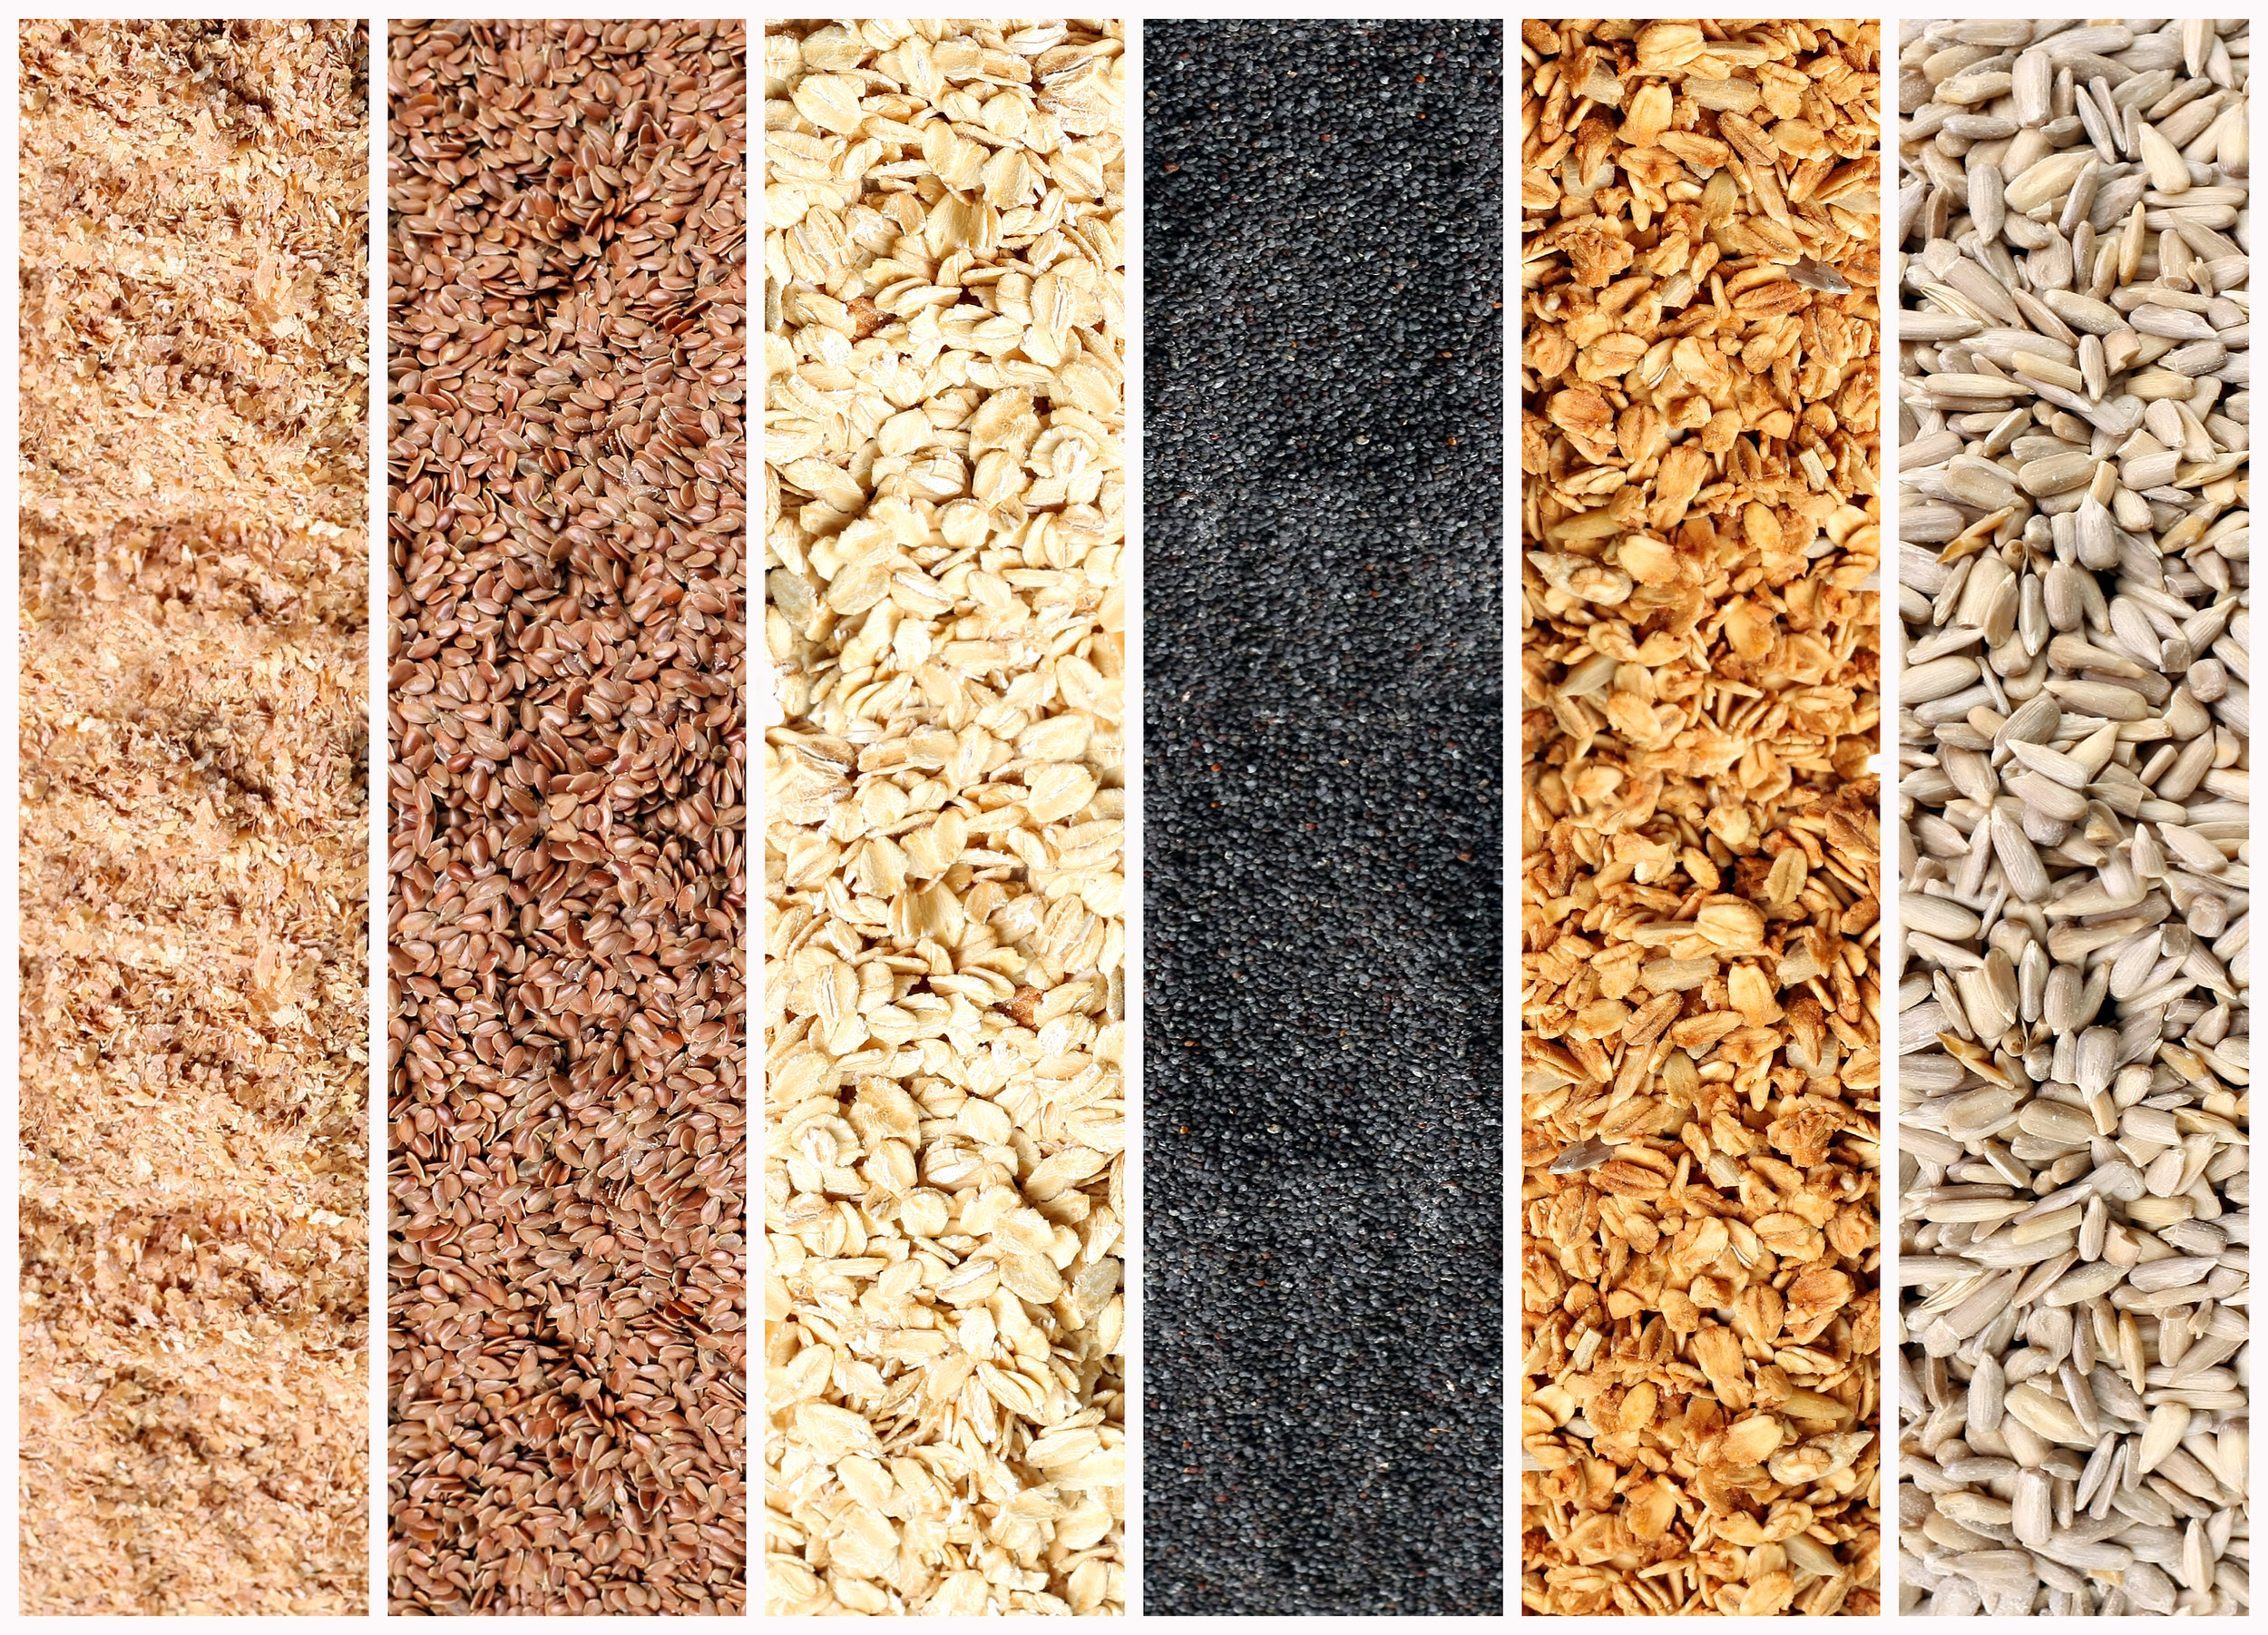 bigstock-Whole-grains-oats-flax-popp-15283010.jpg